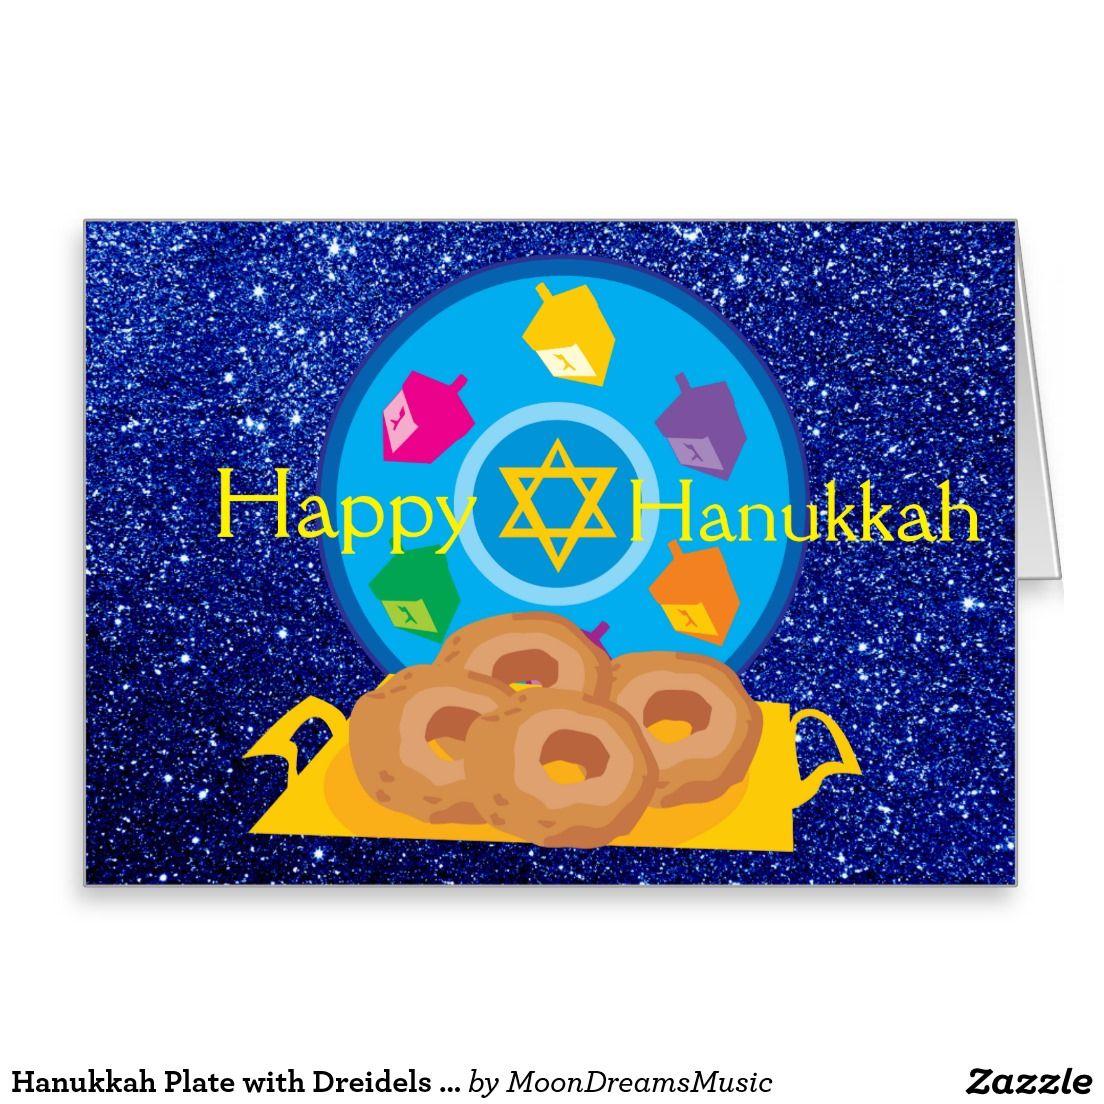 #HanukkahPlate with #Dreidels #BlueFauxGlitter #BlankNoteCard by #MoonDreamsMusic #HanukkahNotecard